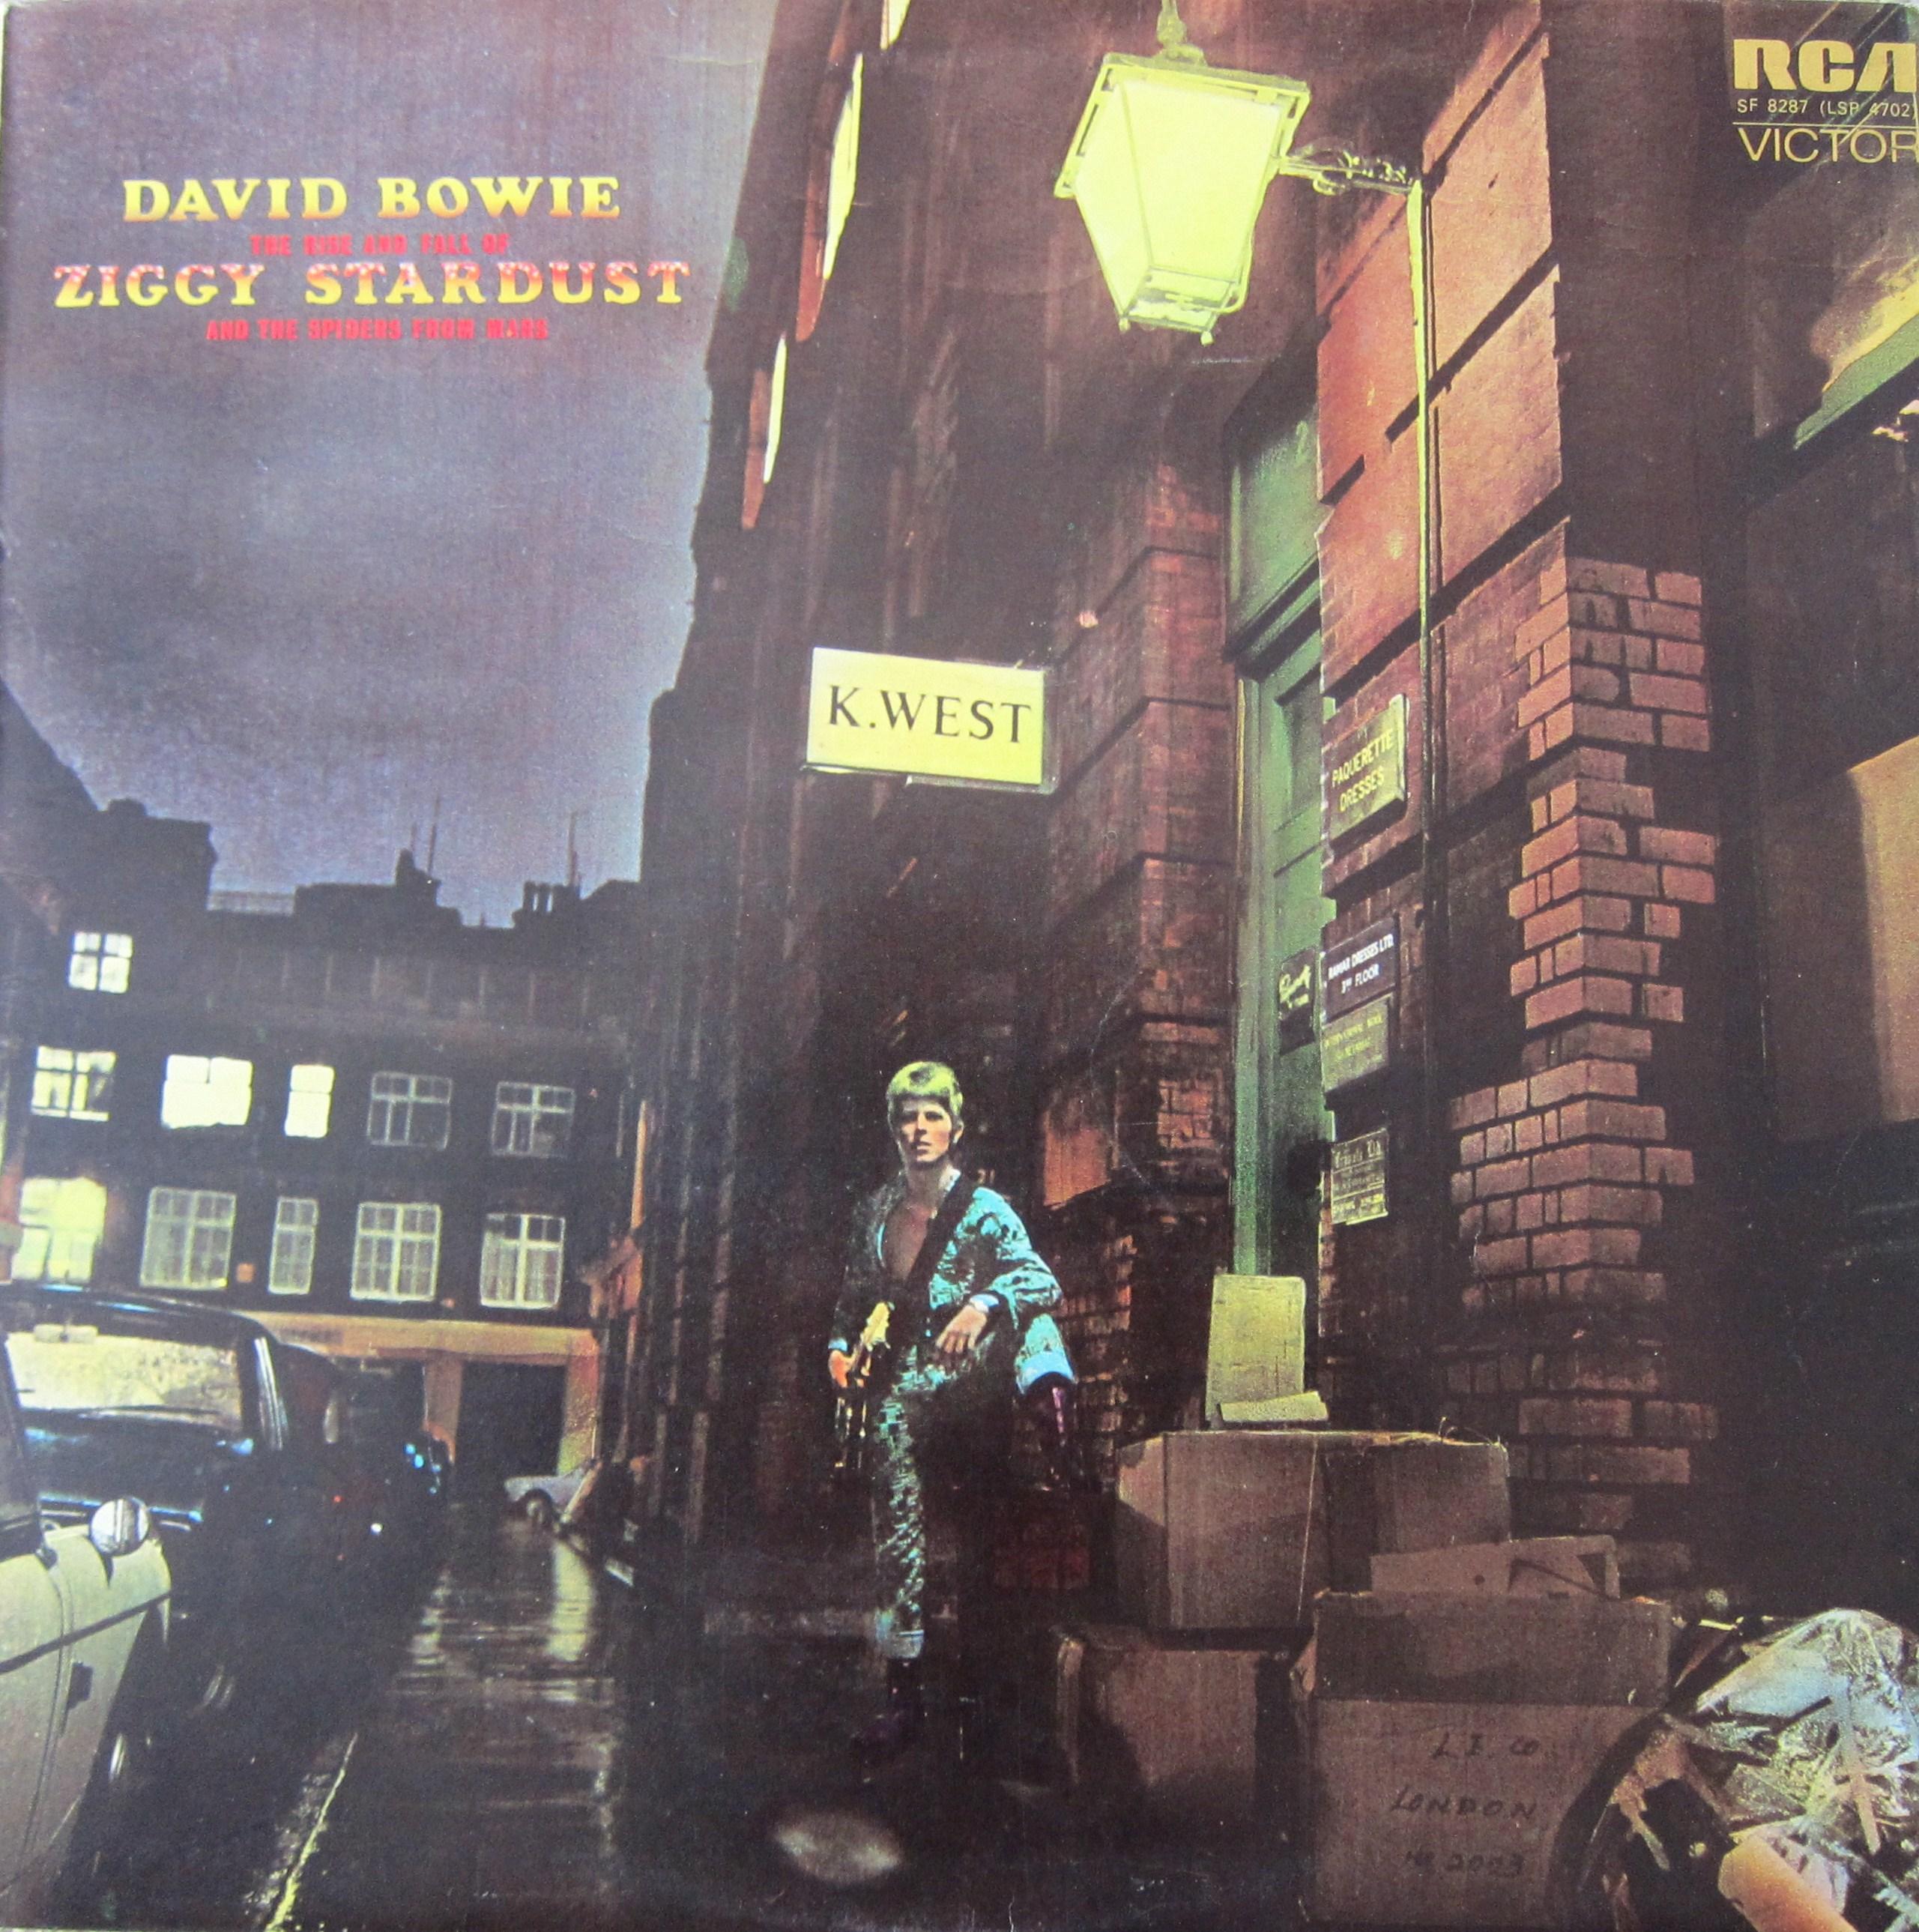 david-bowie-ziggy-stardust-cover.jpg